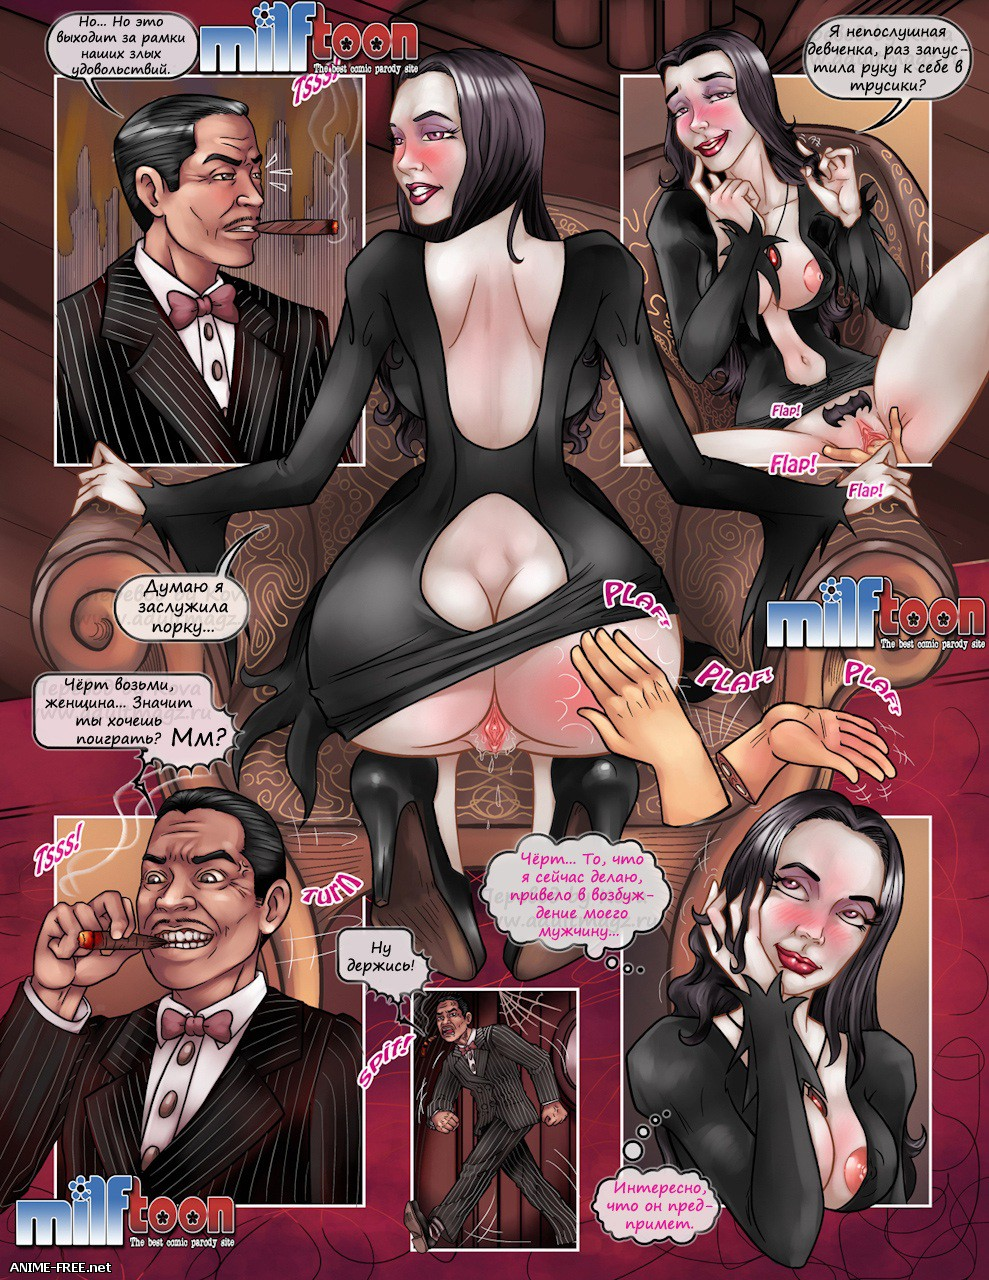 Milftoon - Full SiteRip / Milftoon (Сборник комиксов) + Animation [Uncen] [ENG,RUS] Porn Сomics